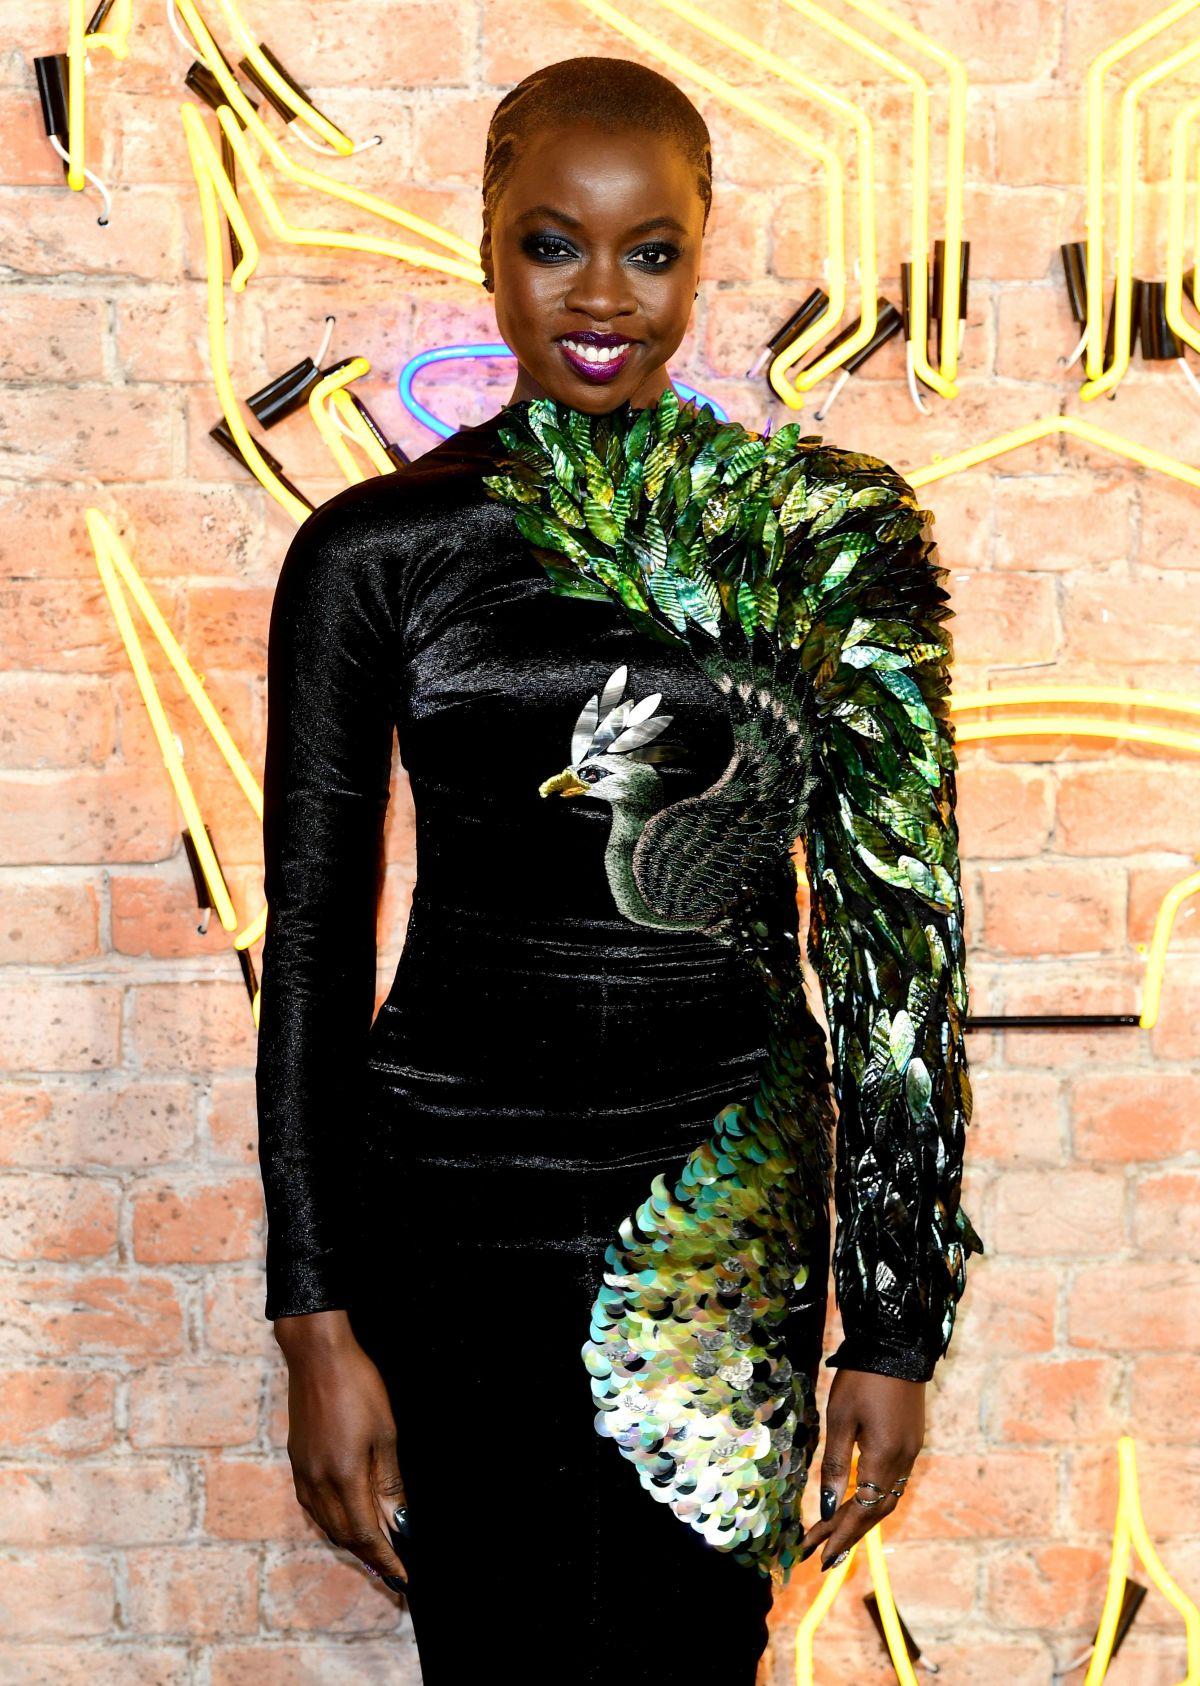 Danai Gurira At Black Panther Premiere In London 02 08